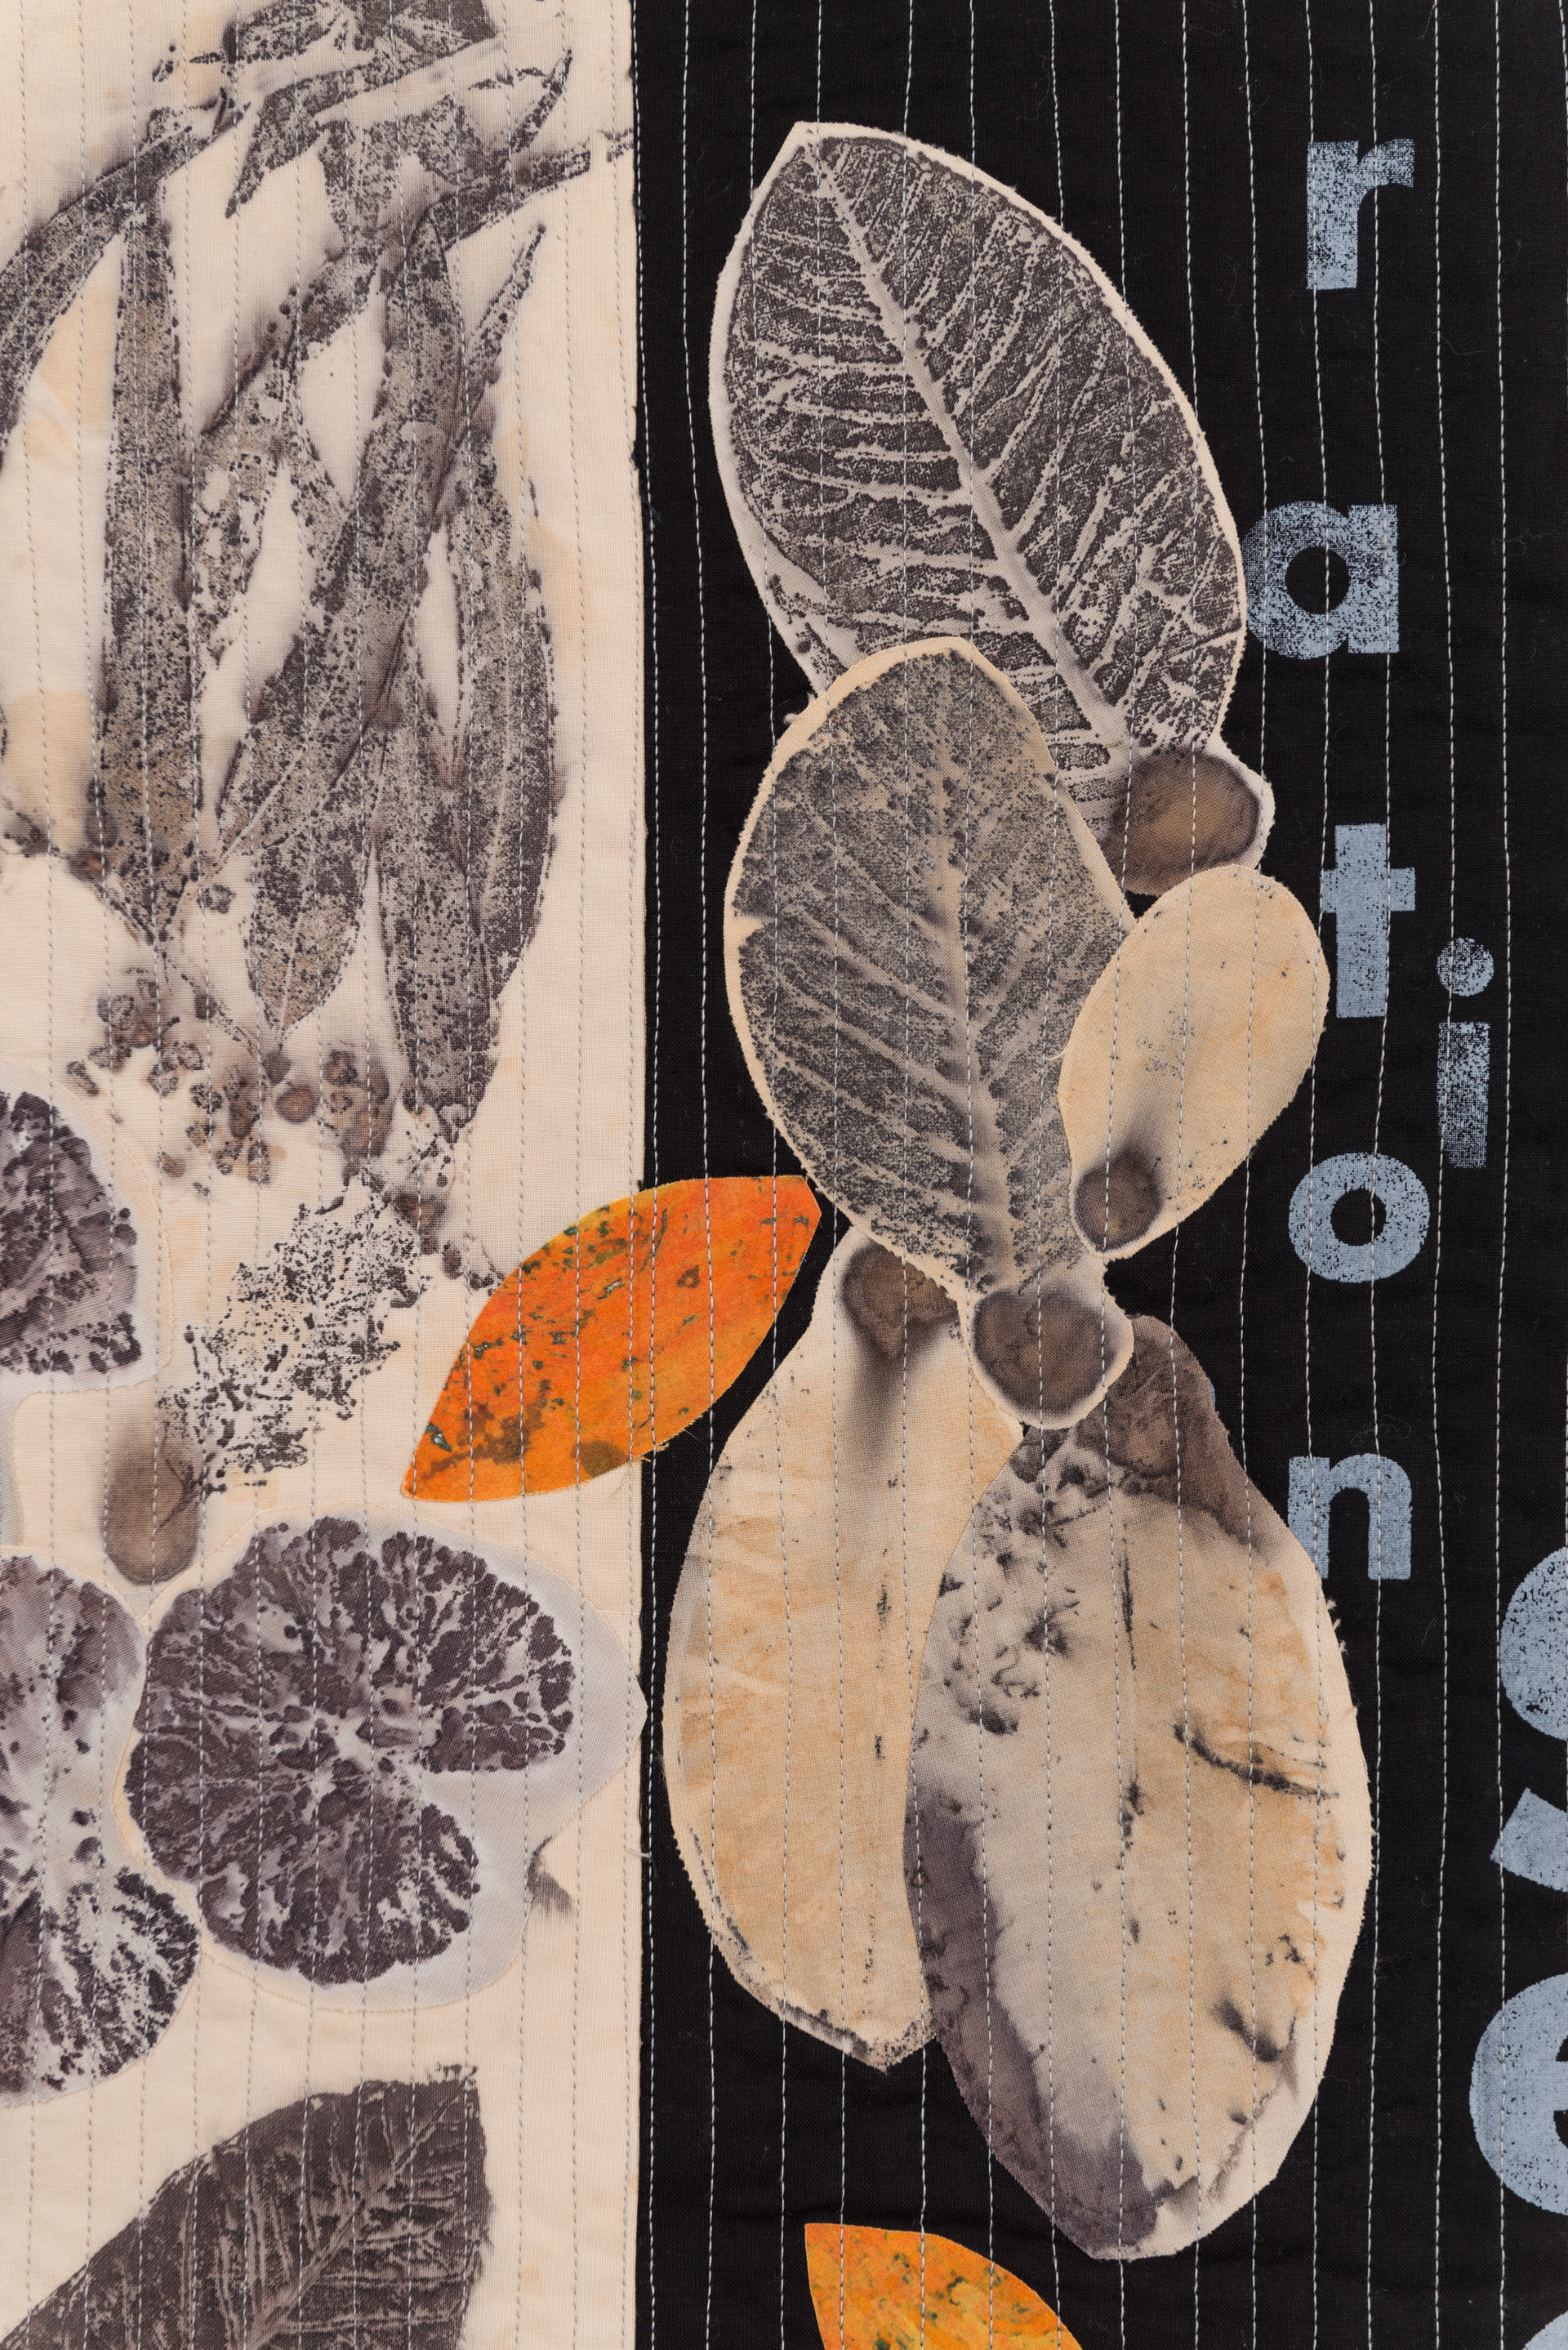 Falling leaves detail